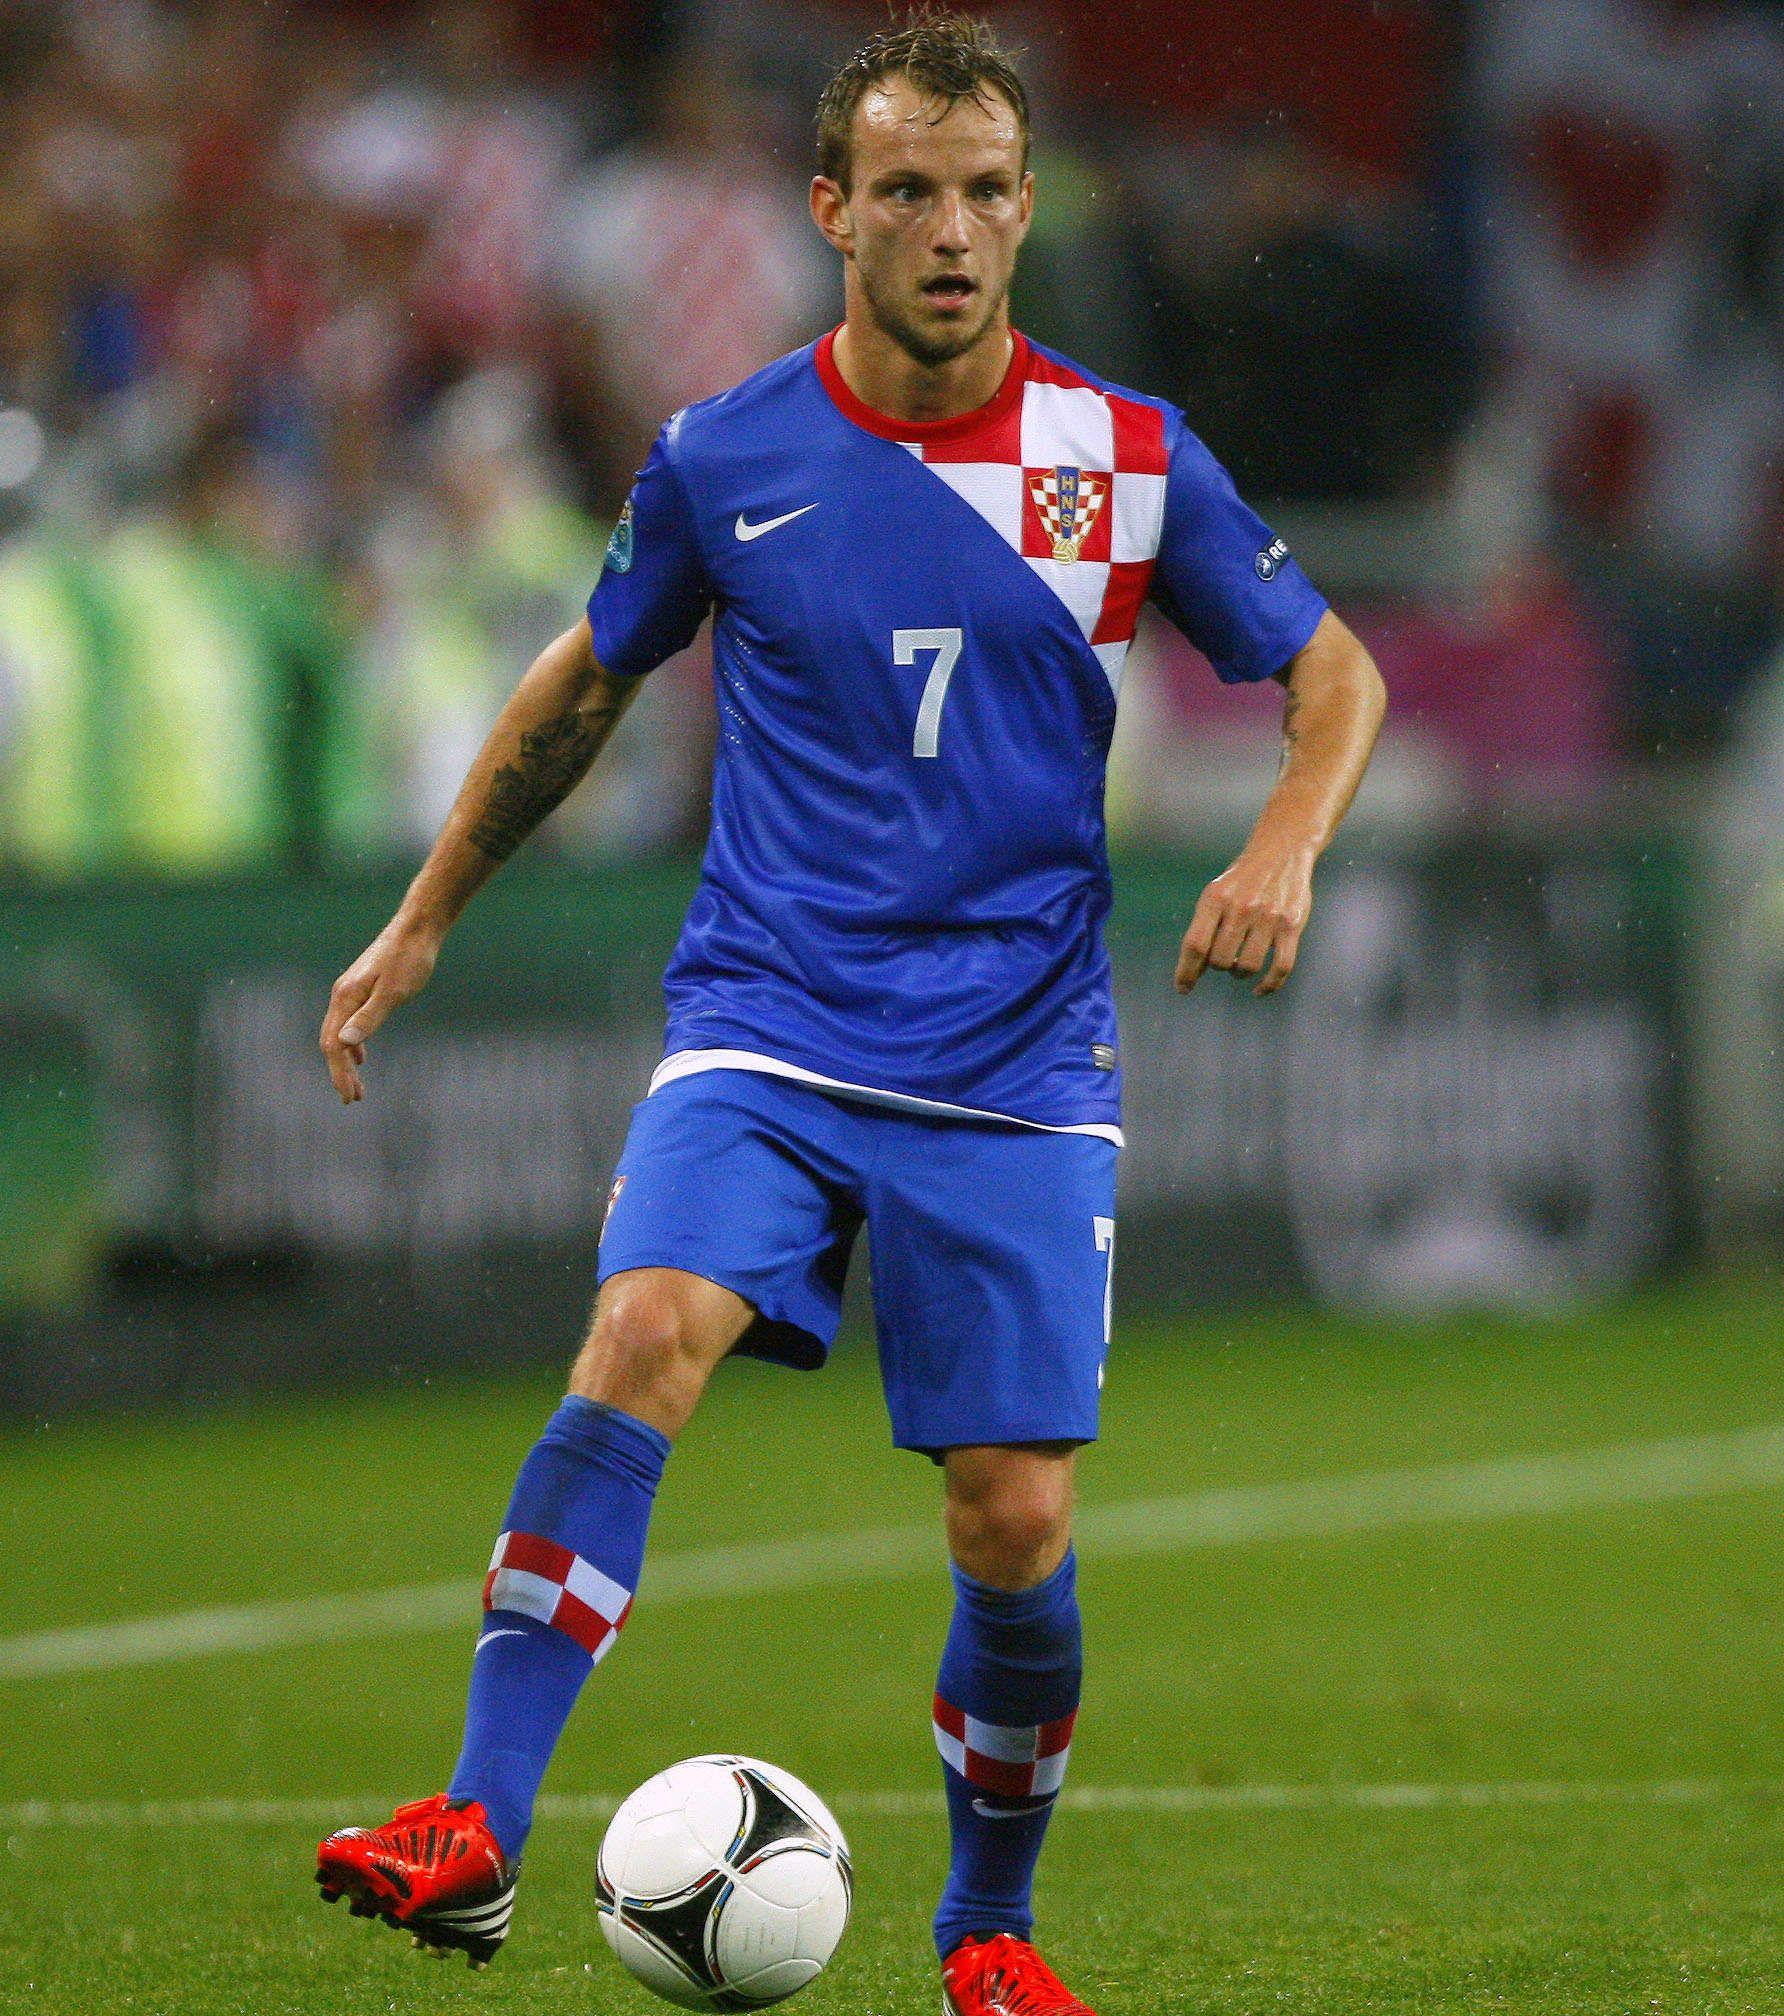 Ivan Rakitic on Croatia National Team Ivan rakitić